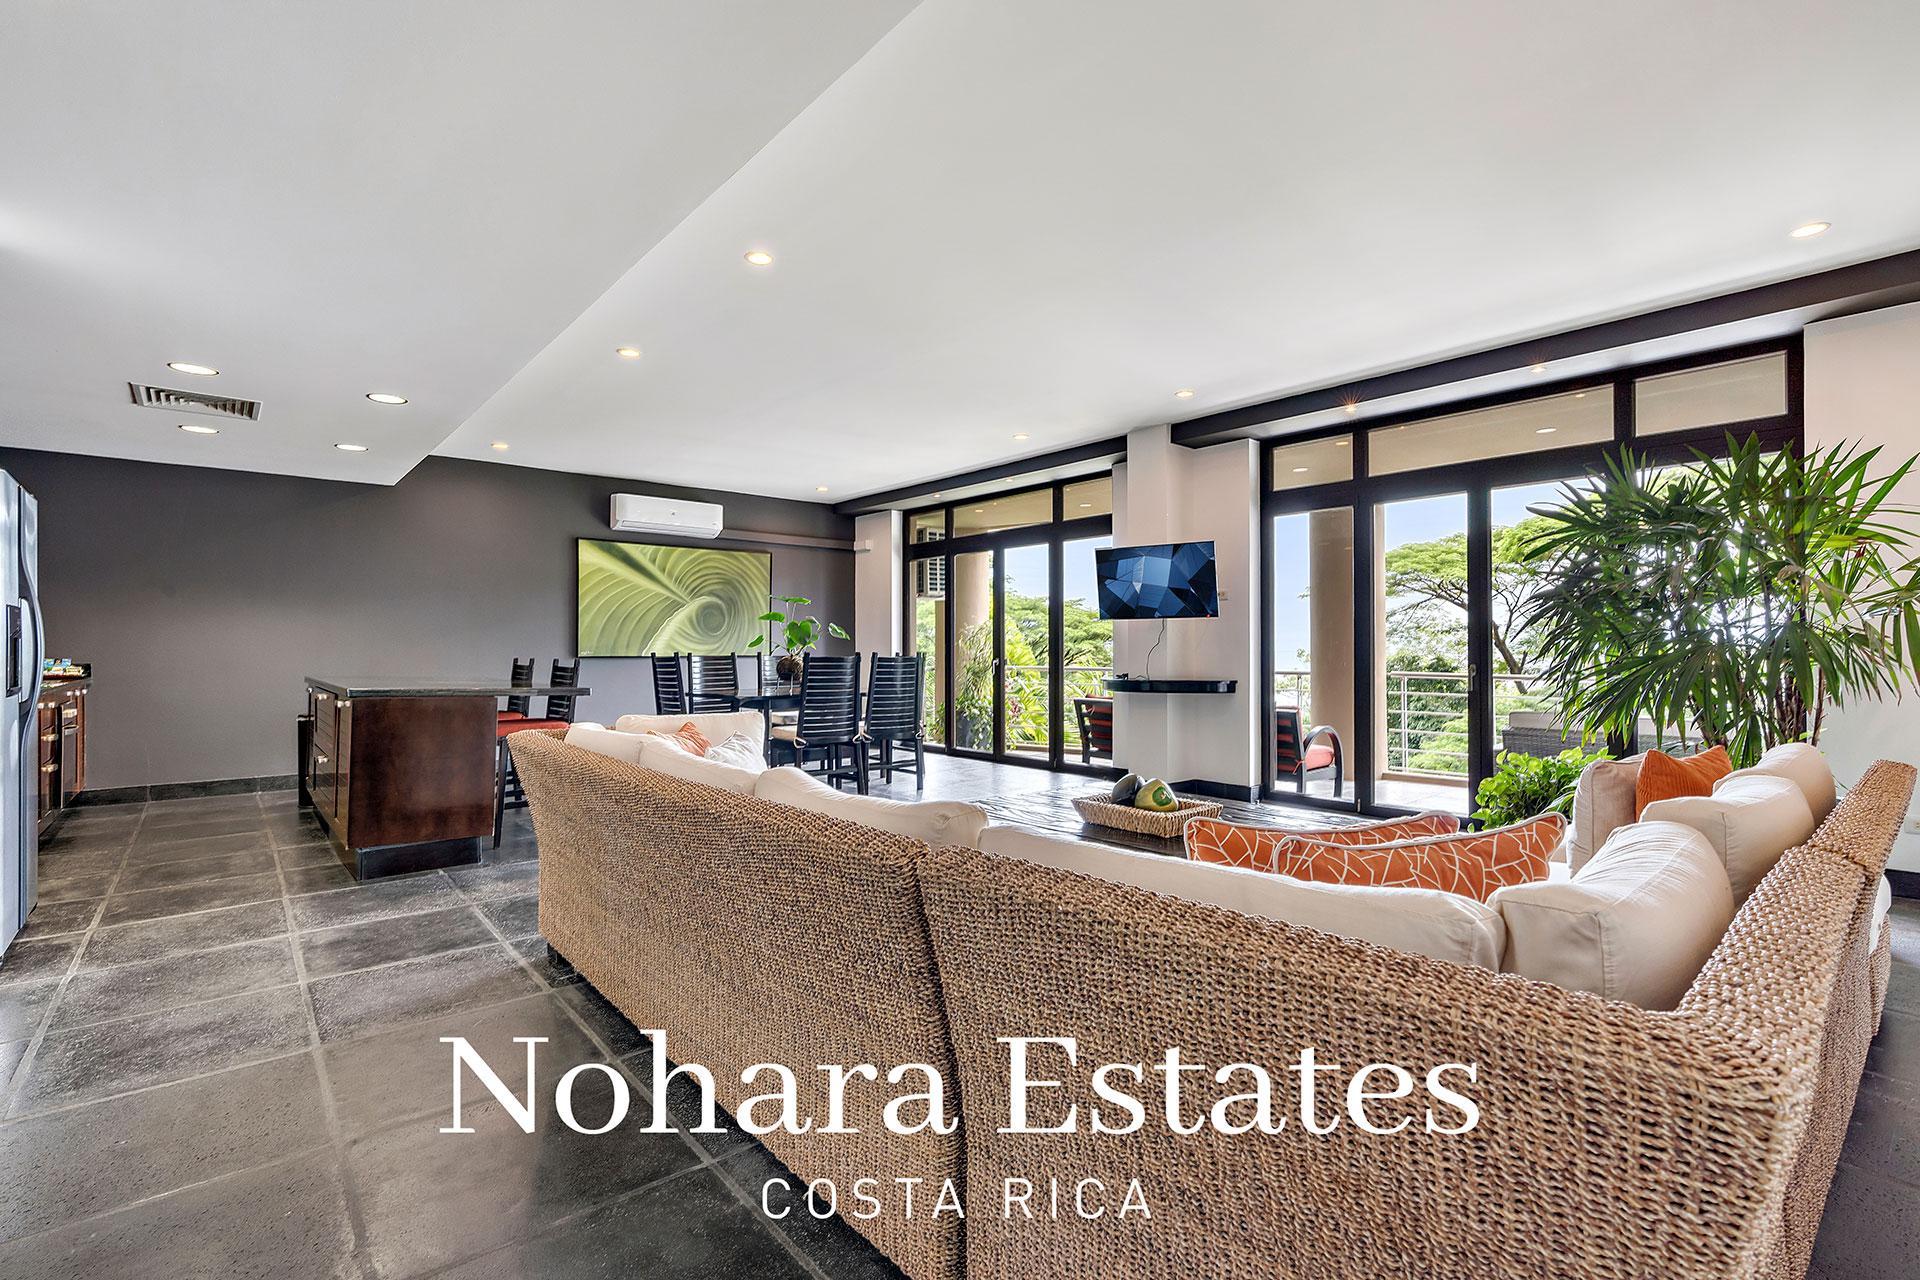 Nohara Estates Costa Rica 125 Apartment Quepos Los Altos 19